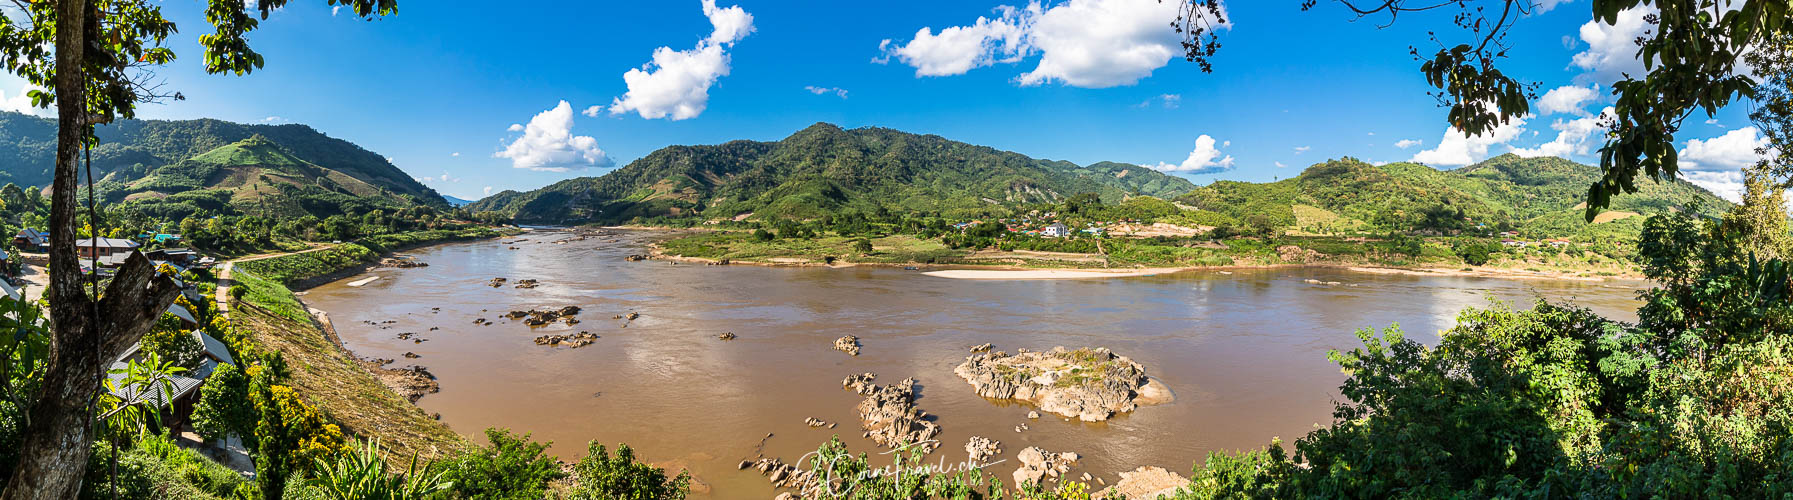 Viewpoint Wiang Kean Mekong